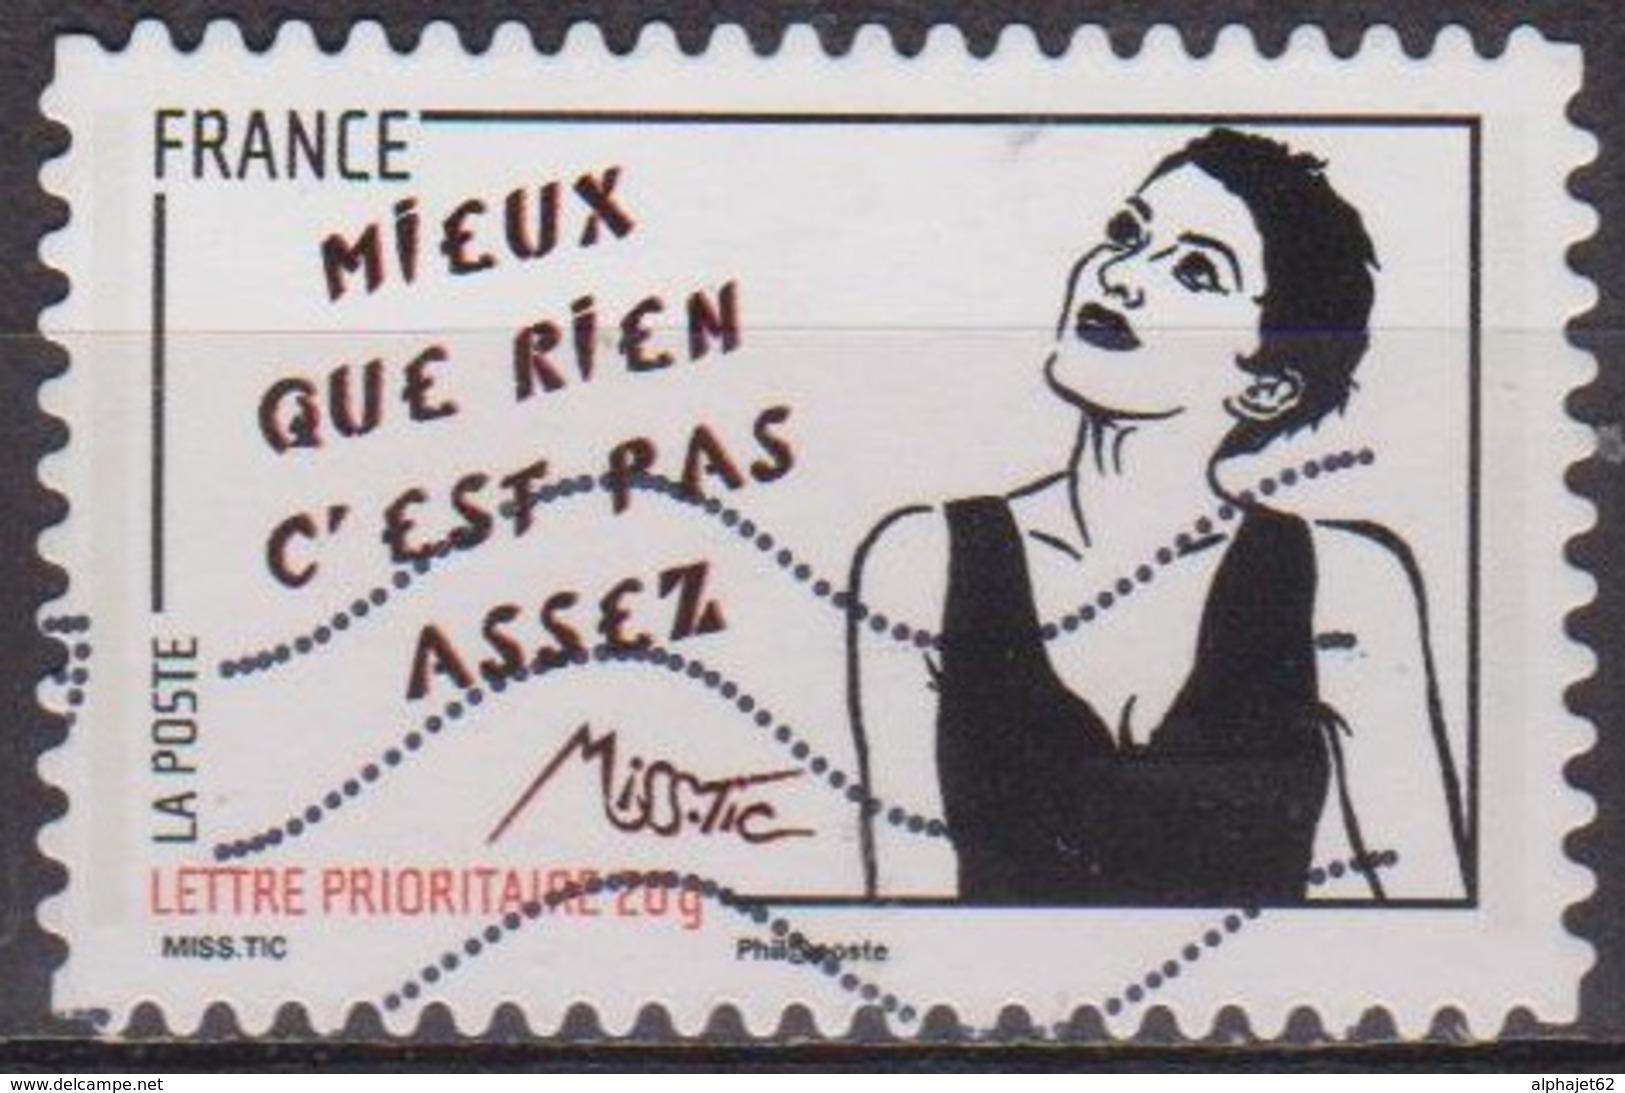 Street Art - FRANCE - Droits De La Femme - Pas Assez - Miss Tic -  N° 547 - 2011 - Frankrijk